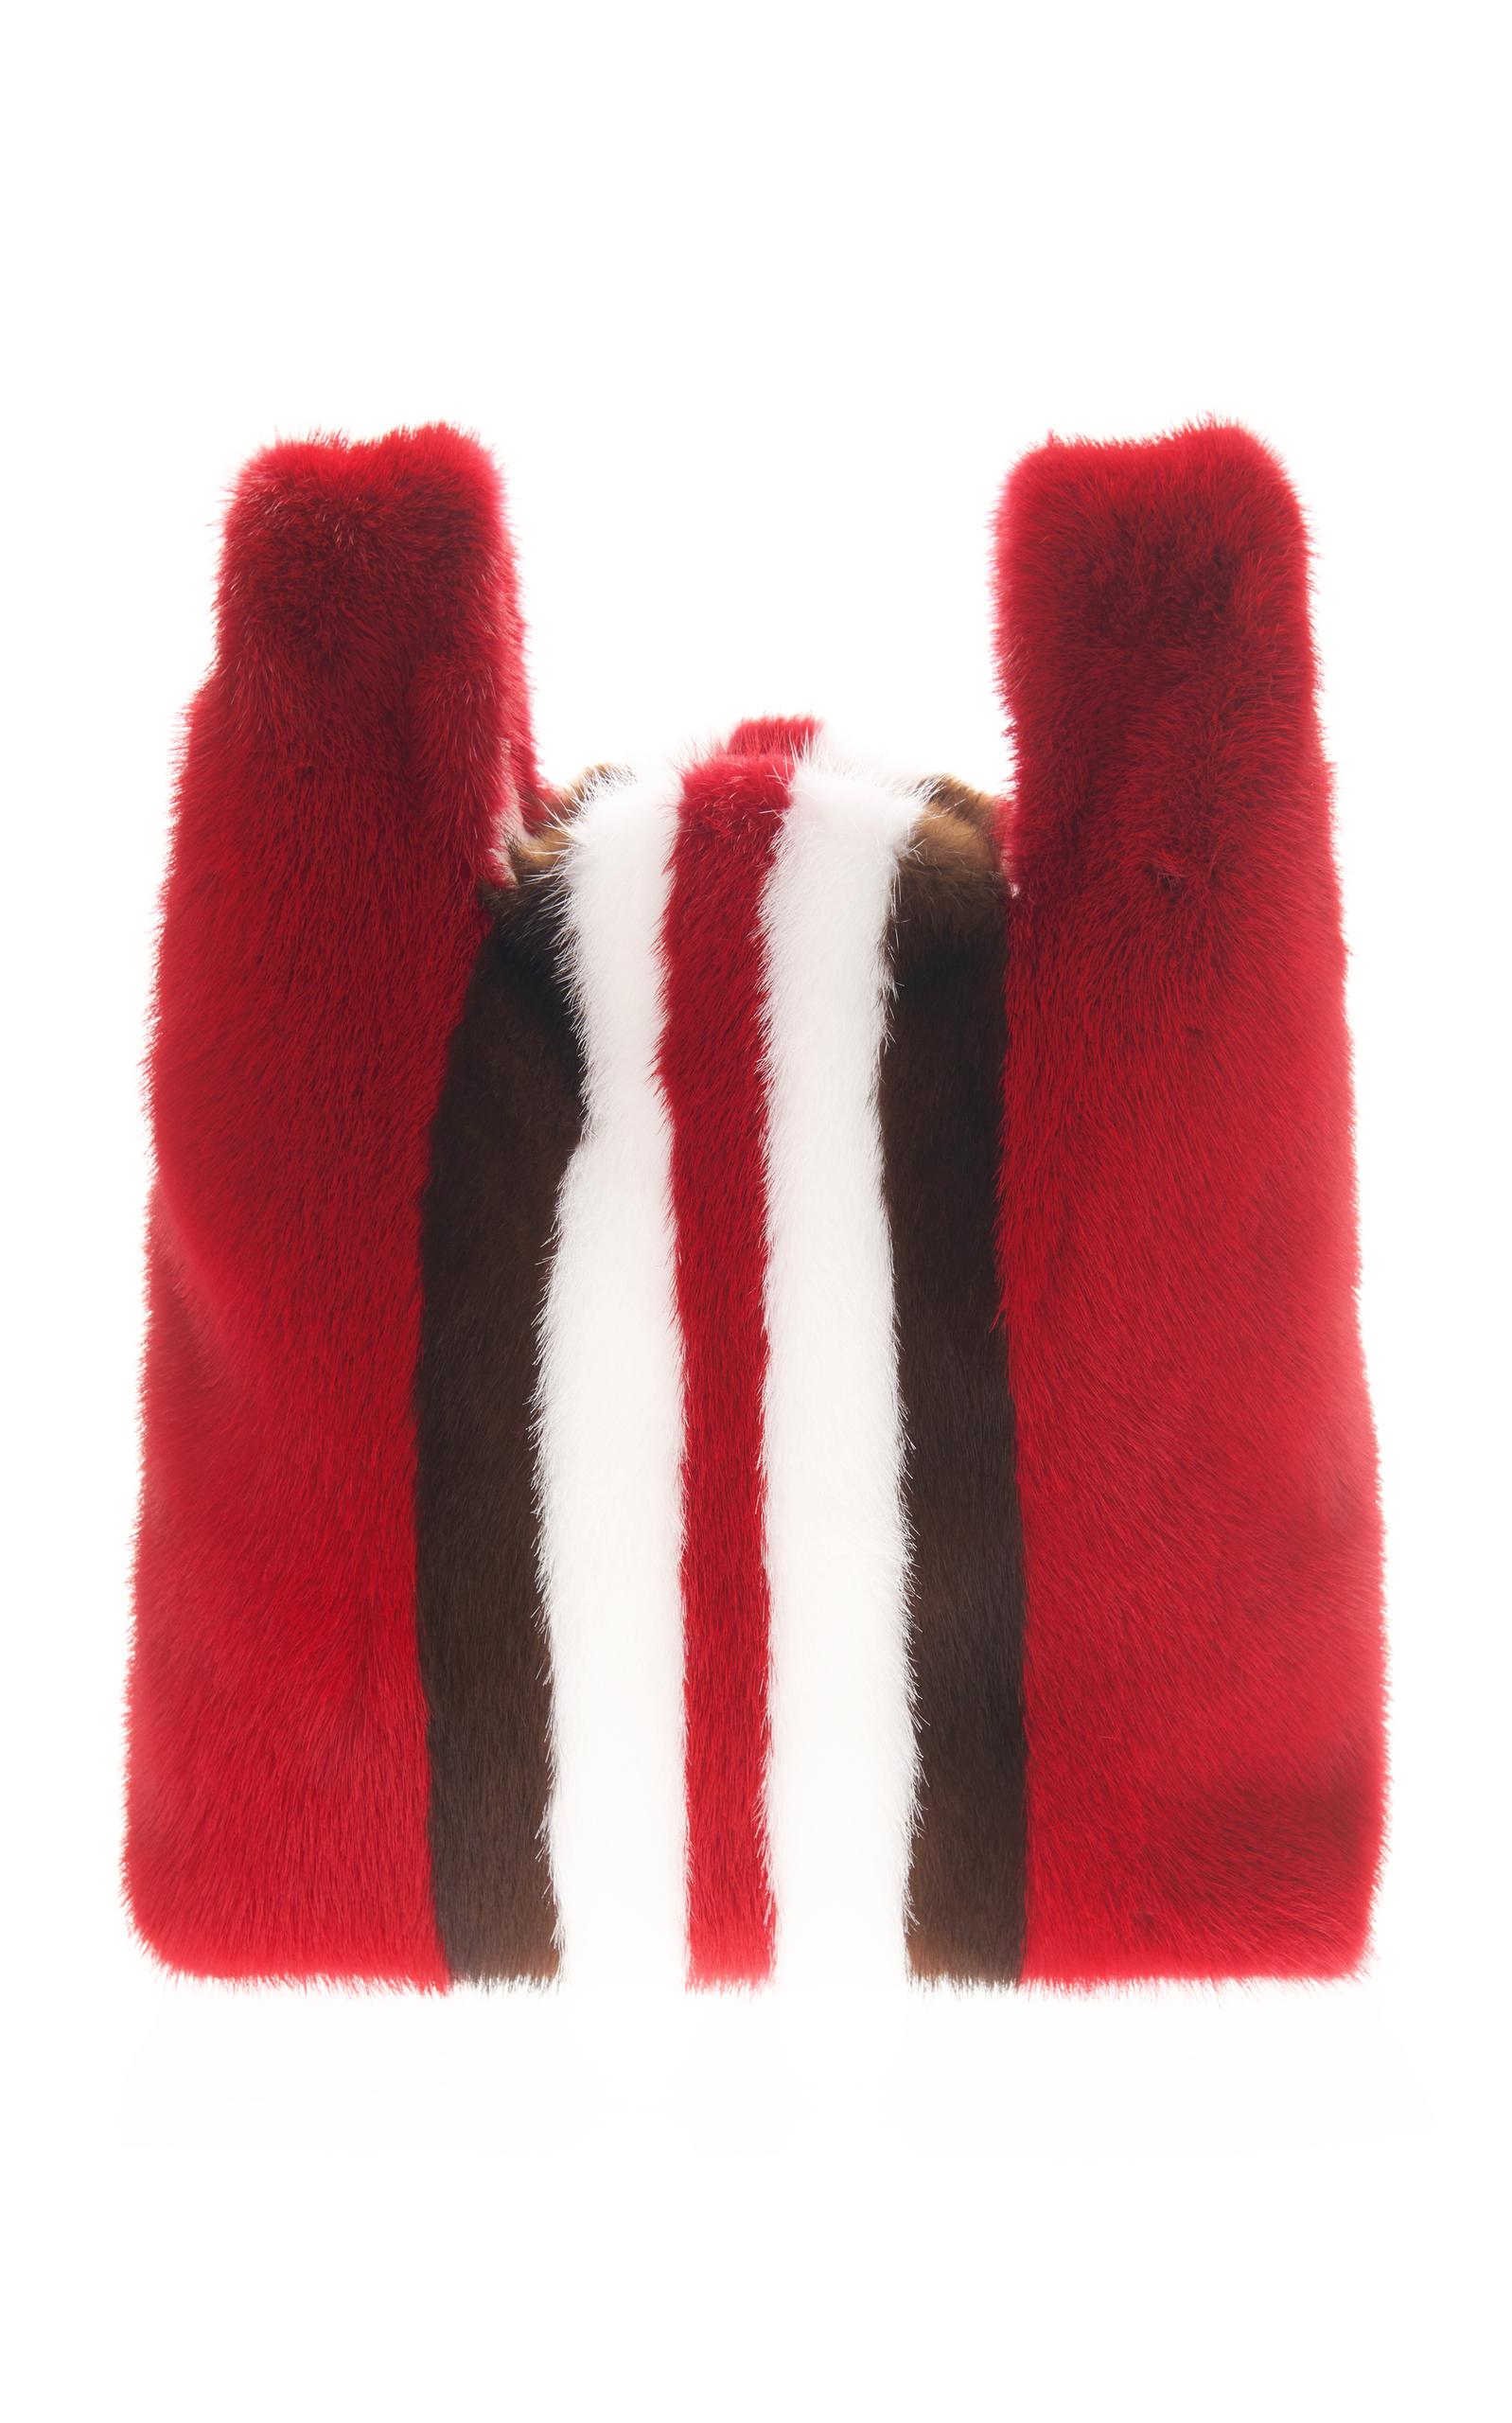 Simonetta Furrissima tote Brand New Unisex For Sale Sale New Styles Cheap Explore RHxYE24m